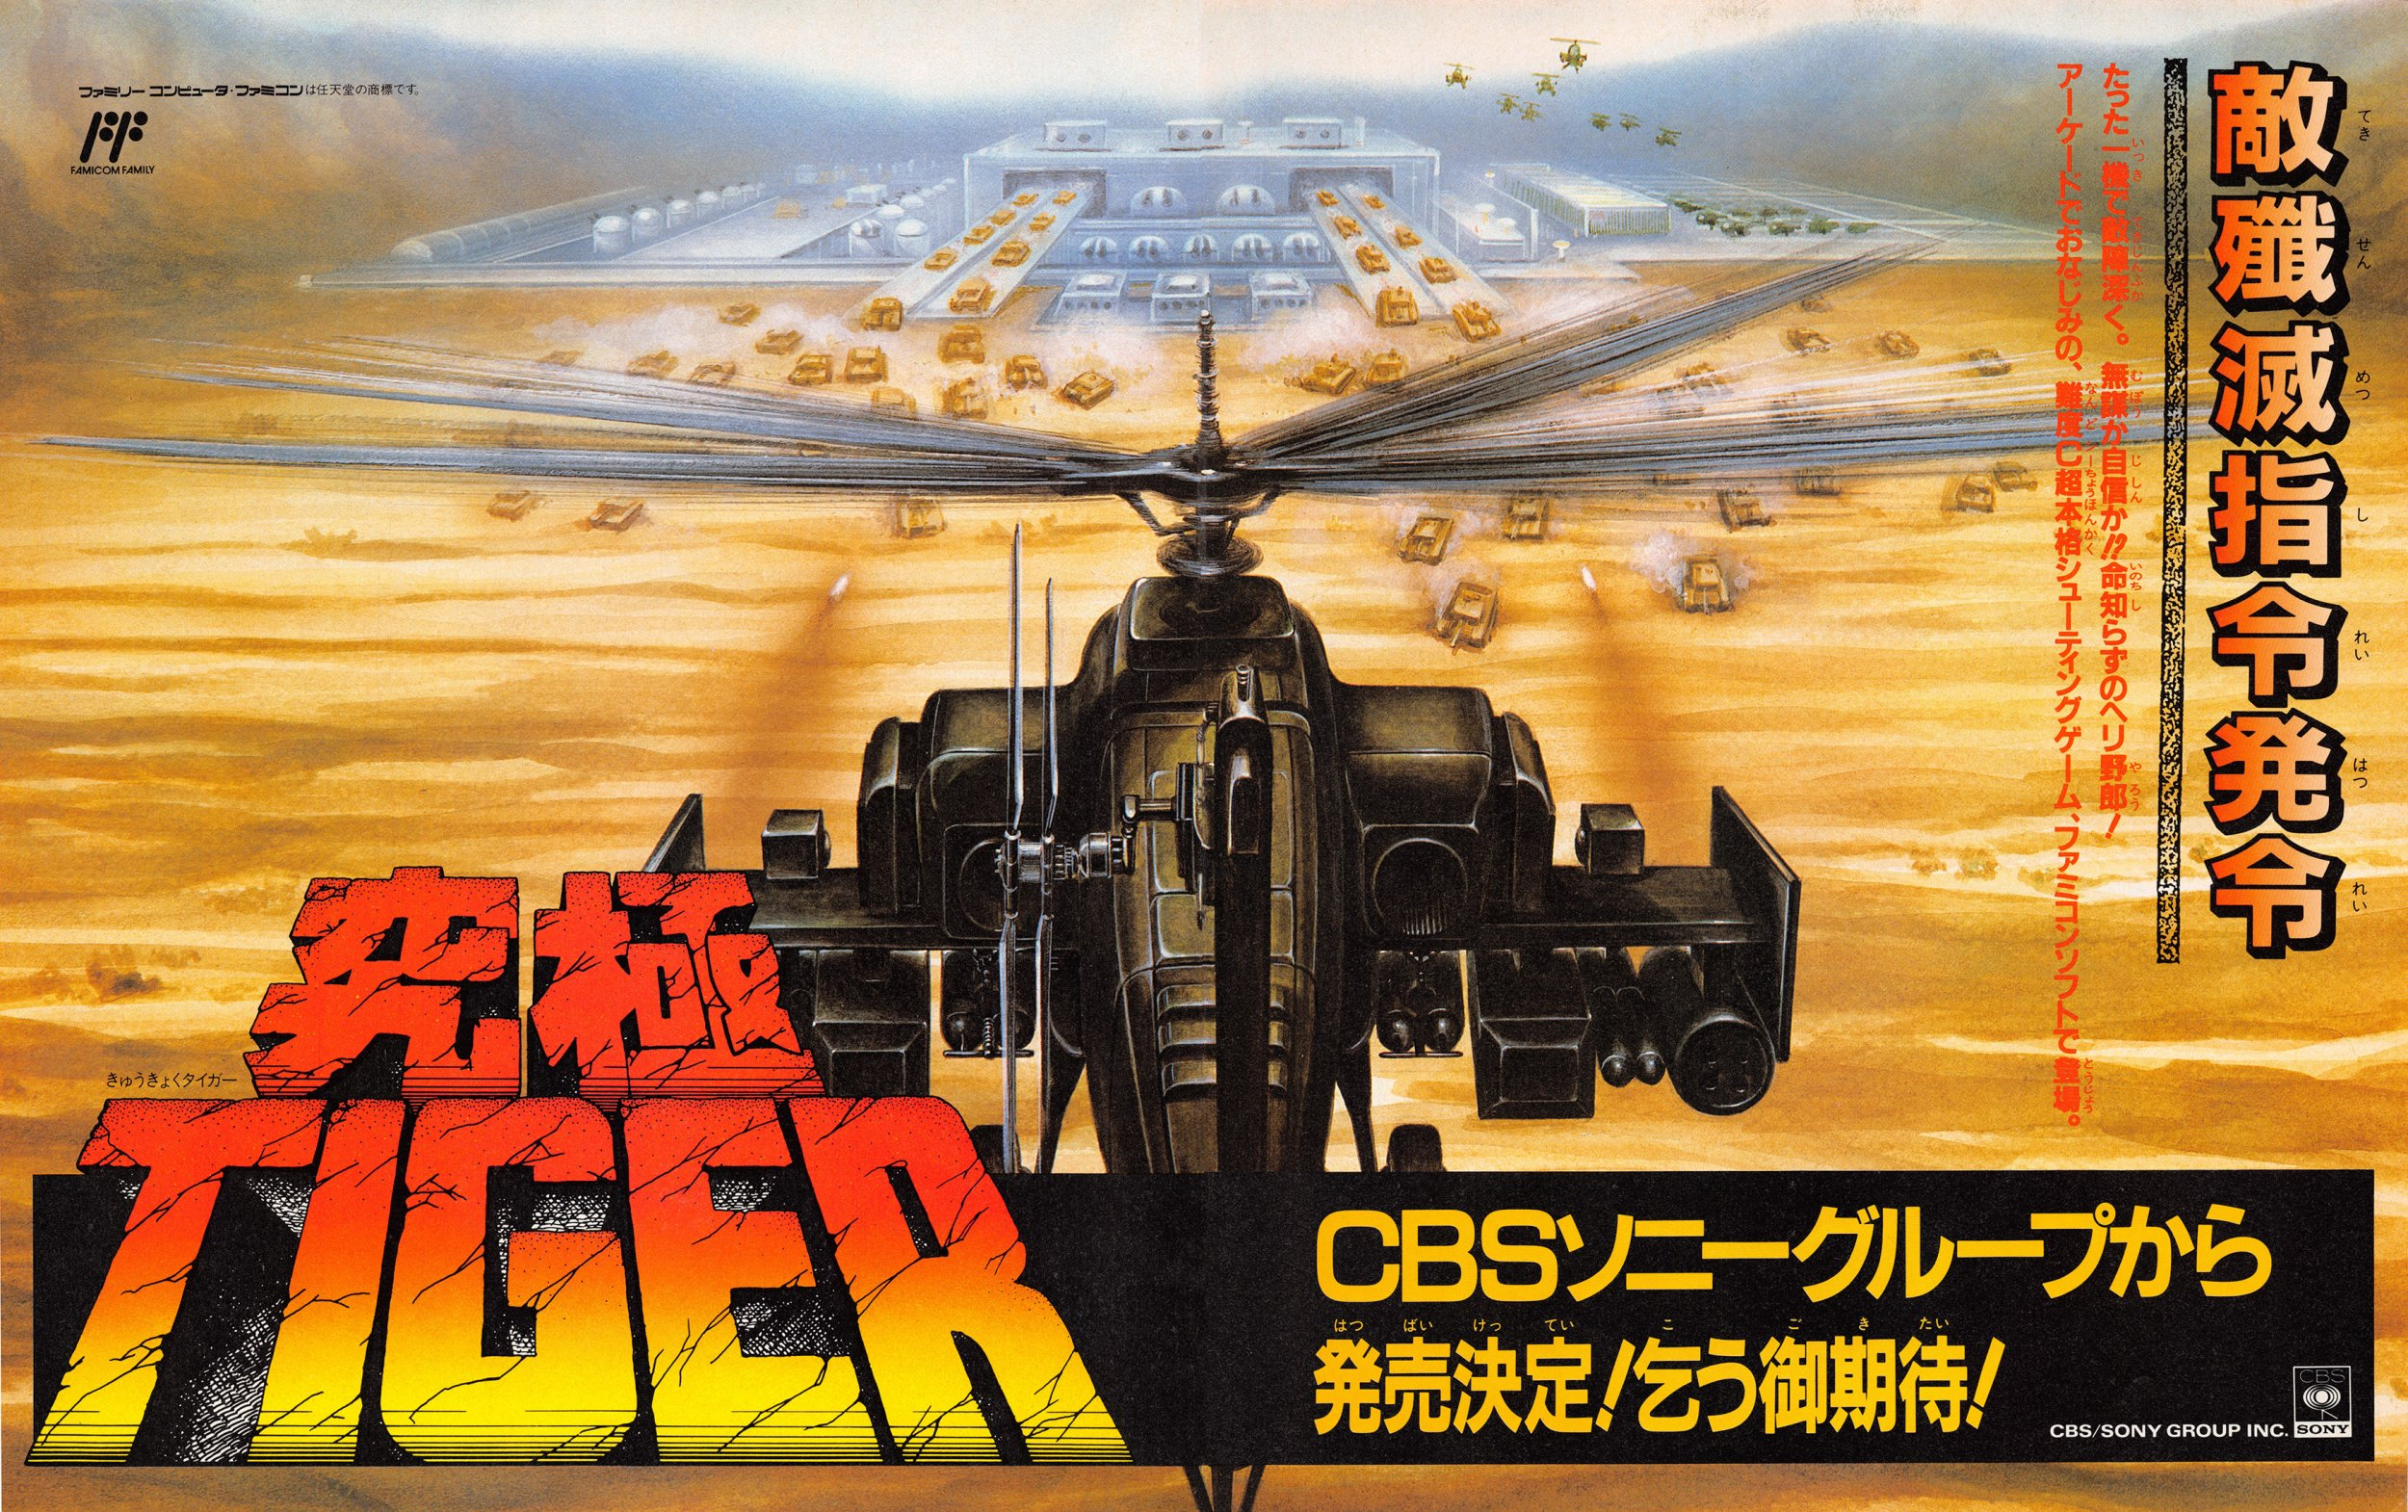 Twin Cobra (Kyuukyoku Tiger) (Japan)